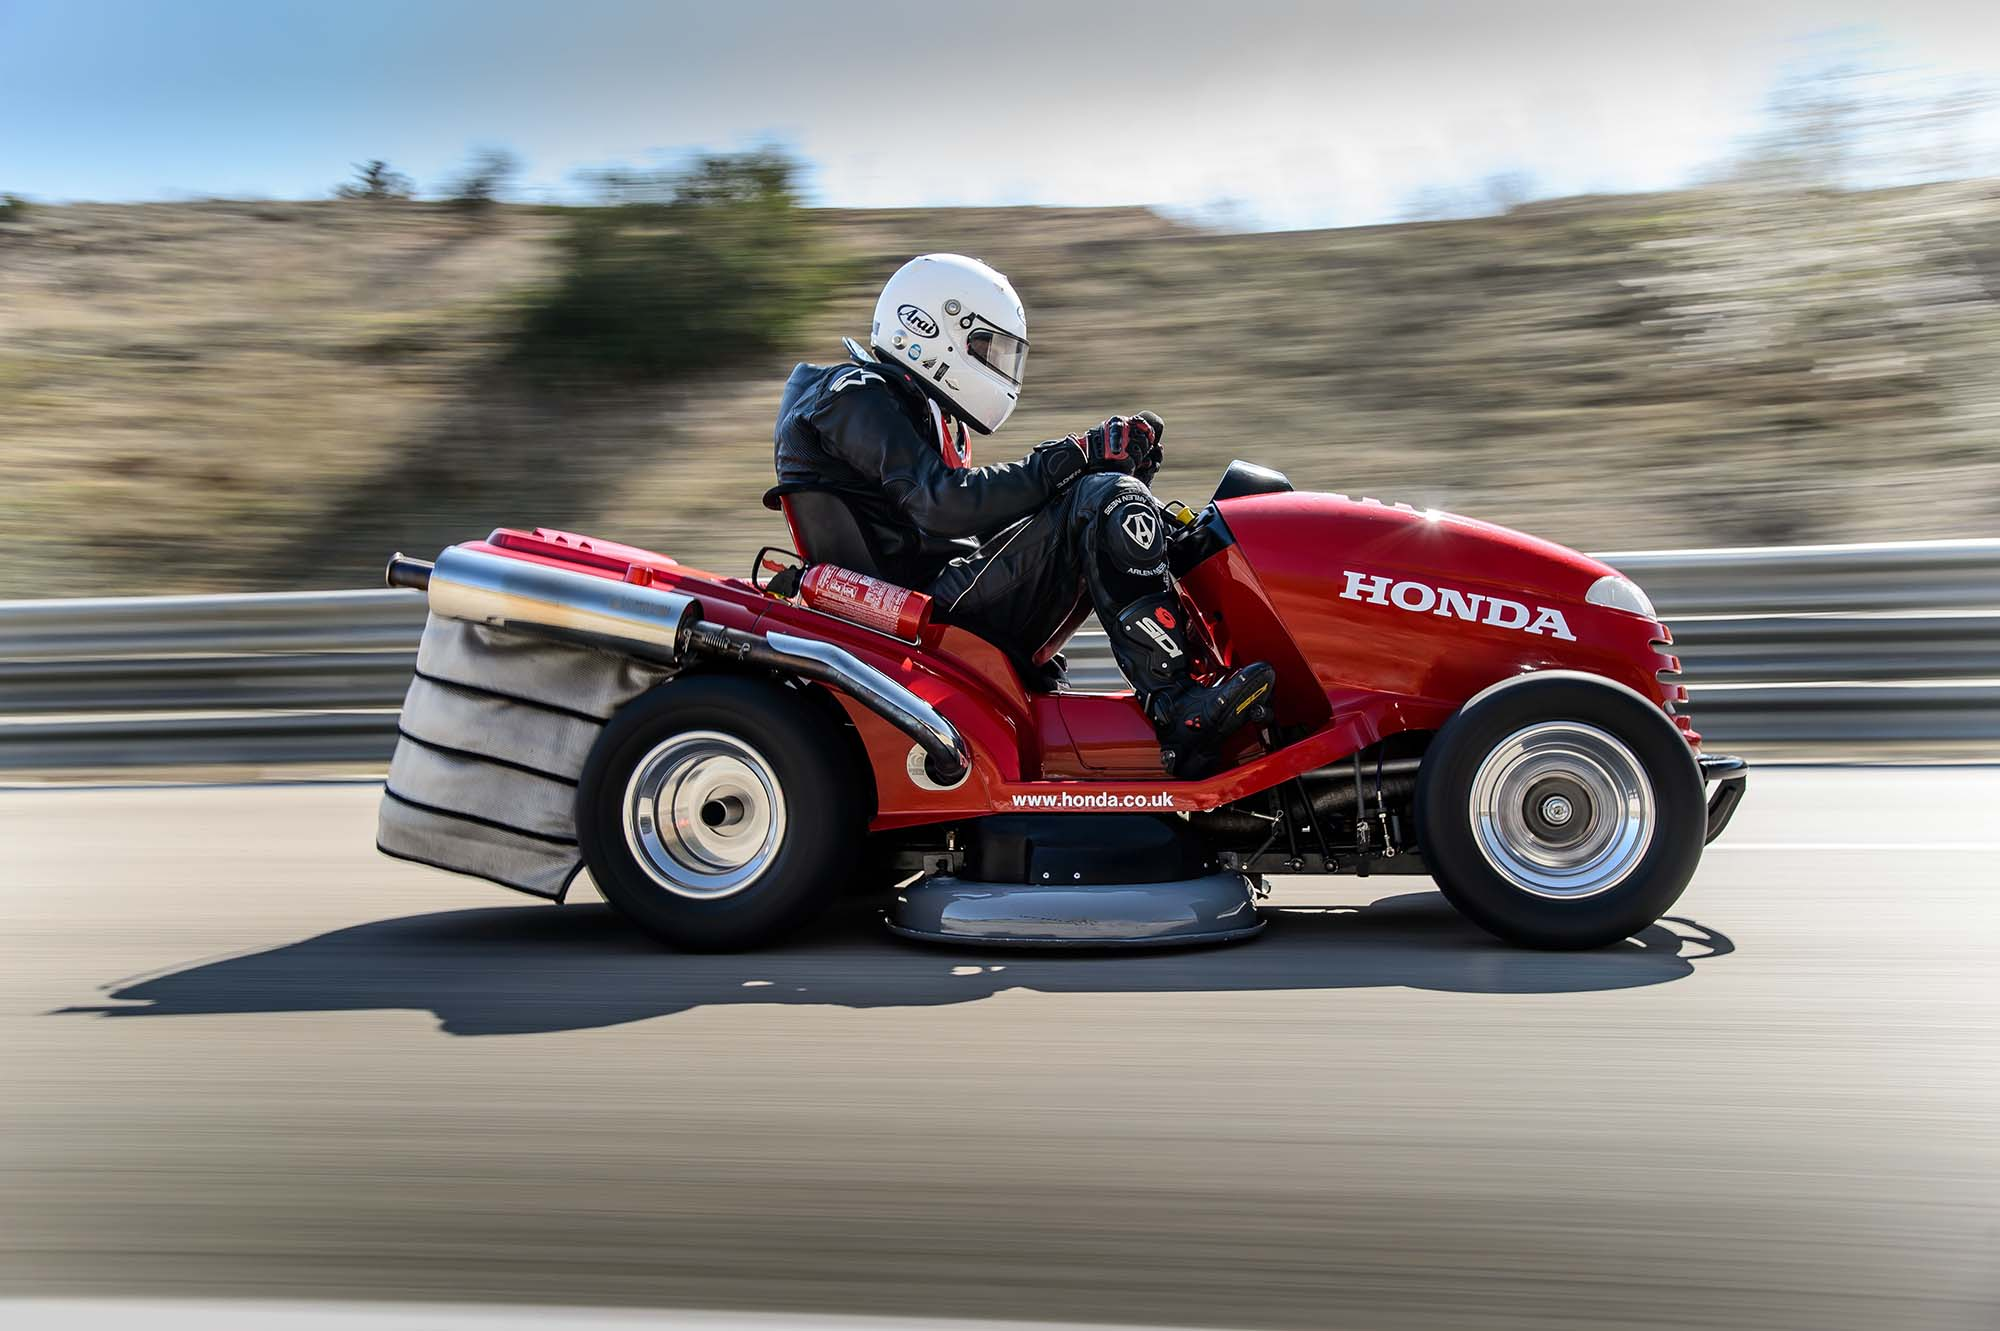 Honda-HF2620-Mean-Mower-lawnmower-land-speed-record-11.jpg